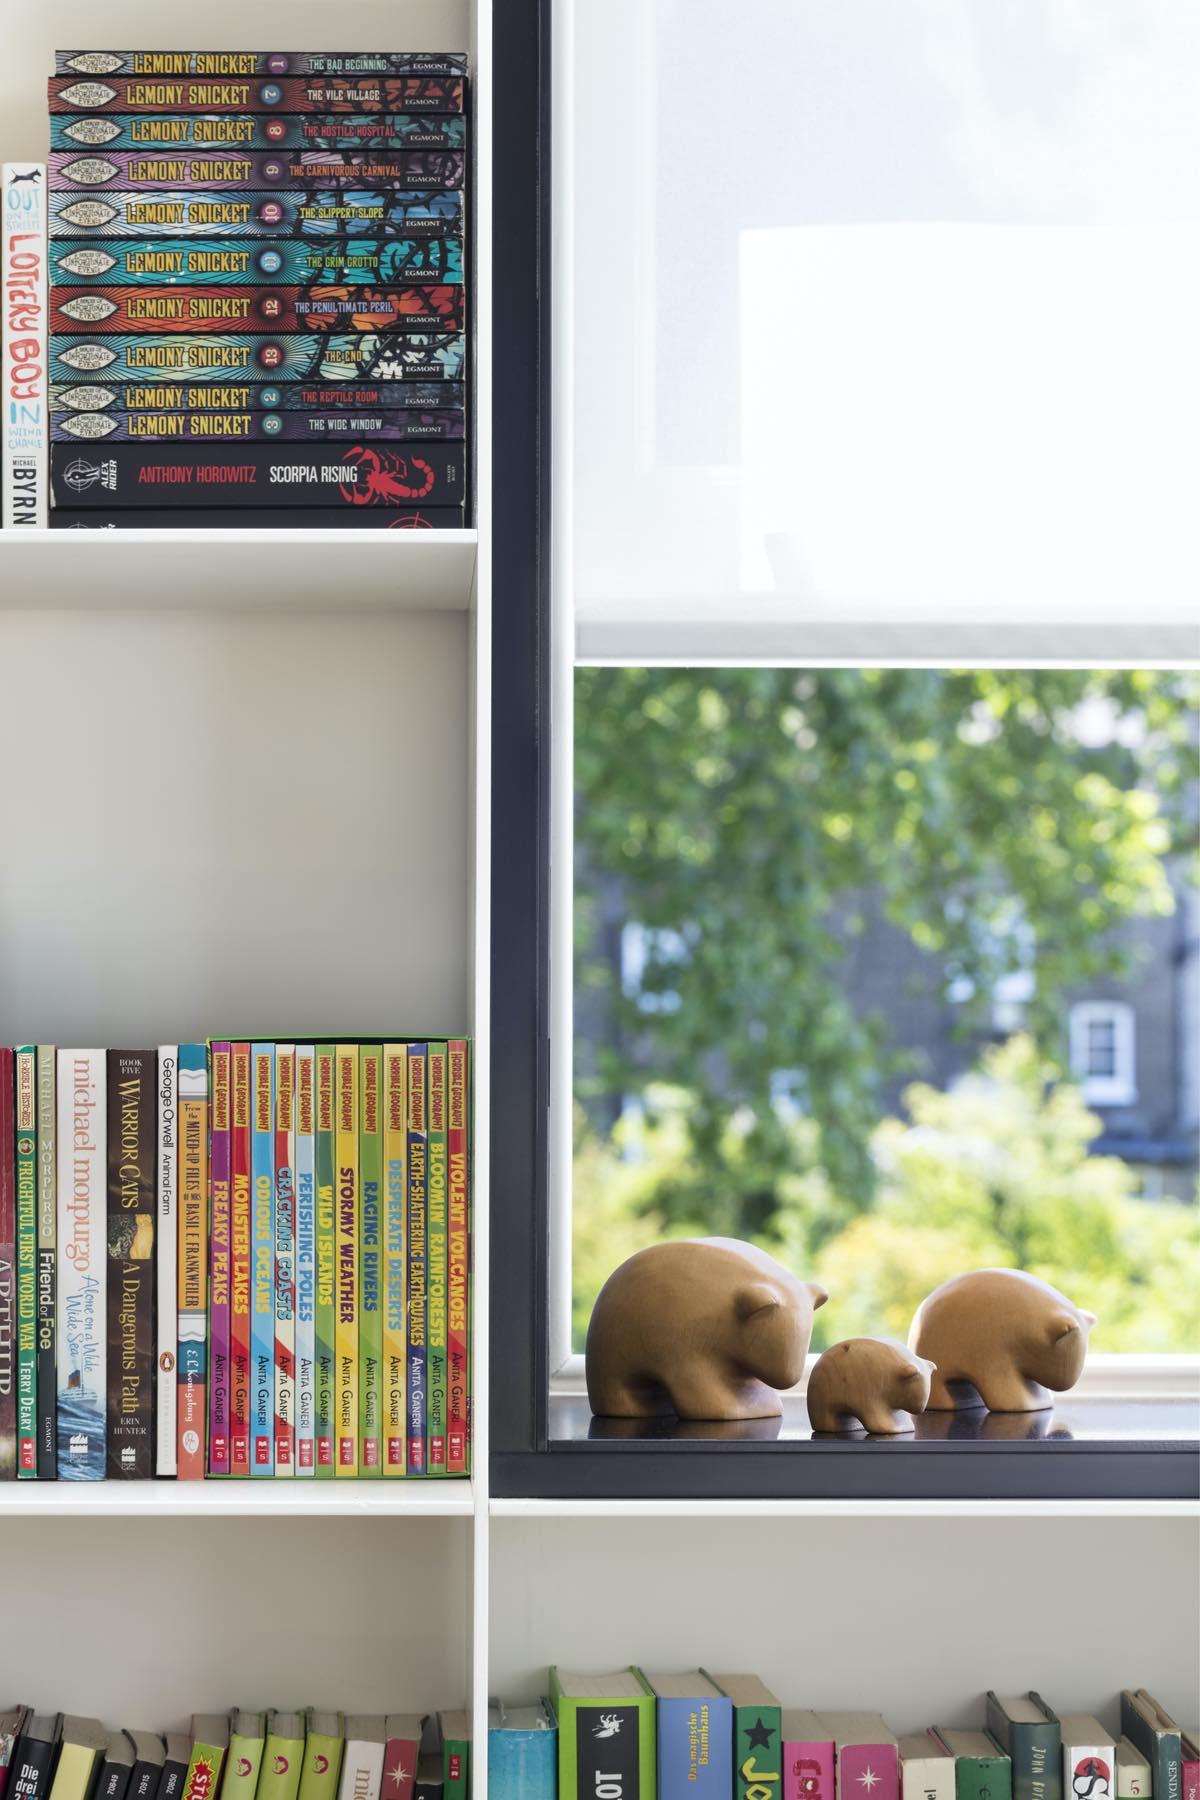 bookshelf located near window